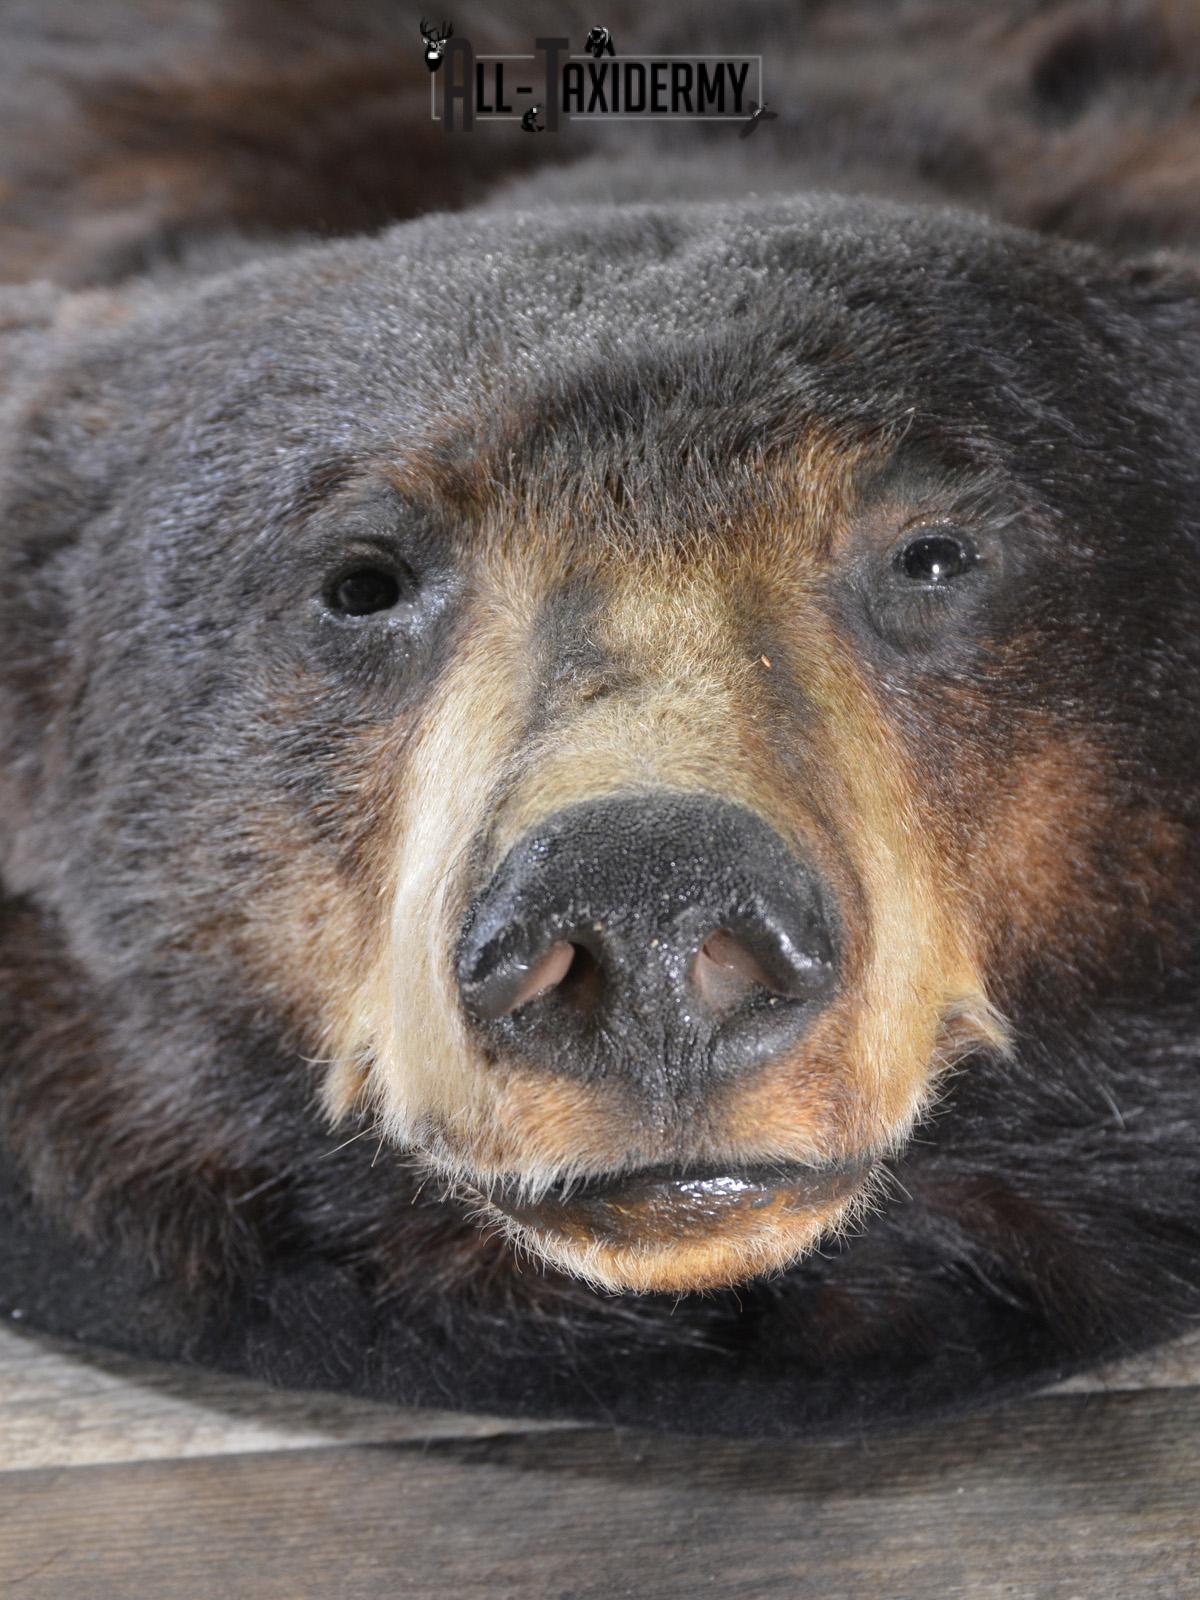 Black Bear taxidermy rug for sale SKU 1924